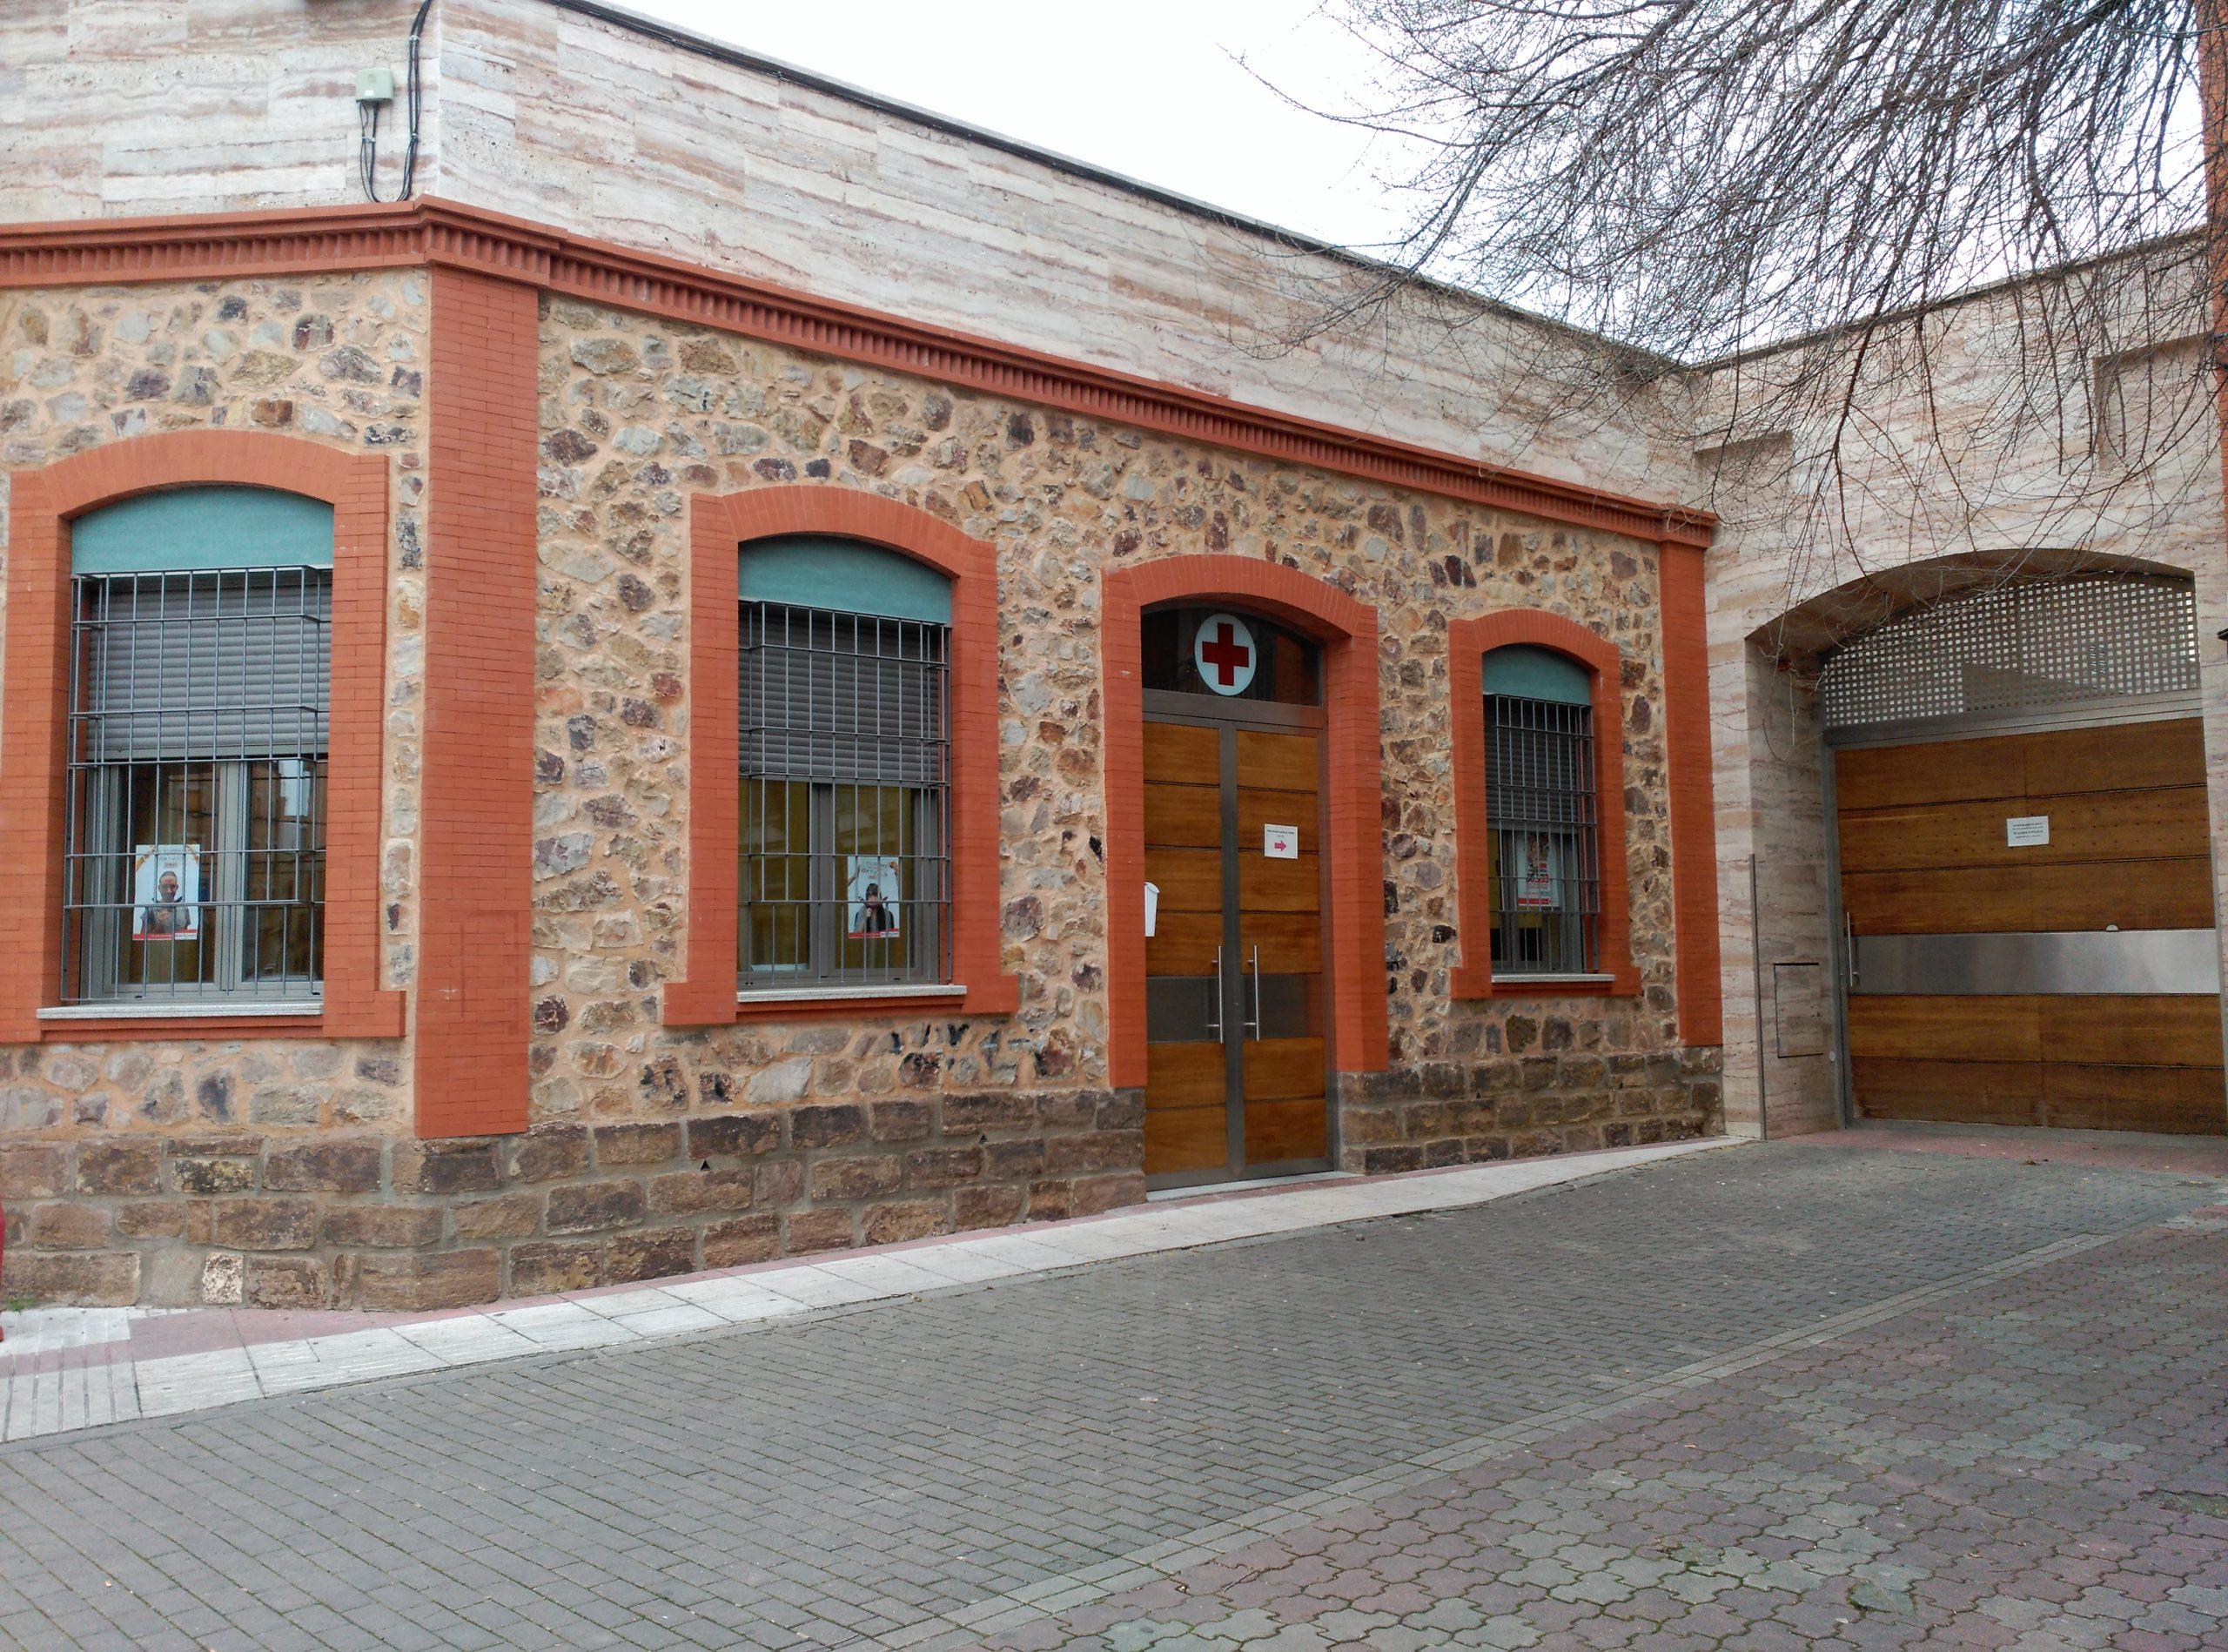 Edificio de la Cruz Roja. 2019 Fotografía F. Negrete